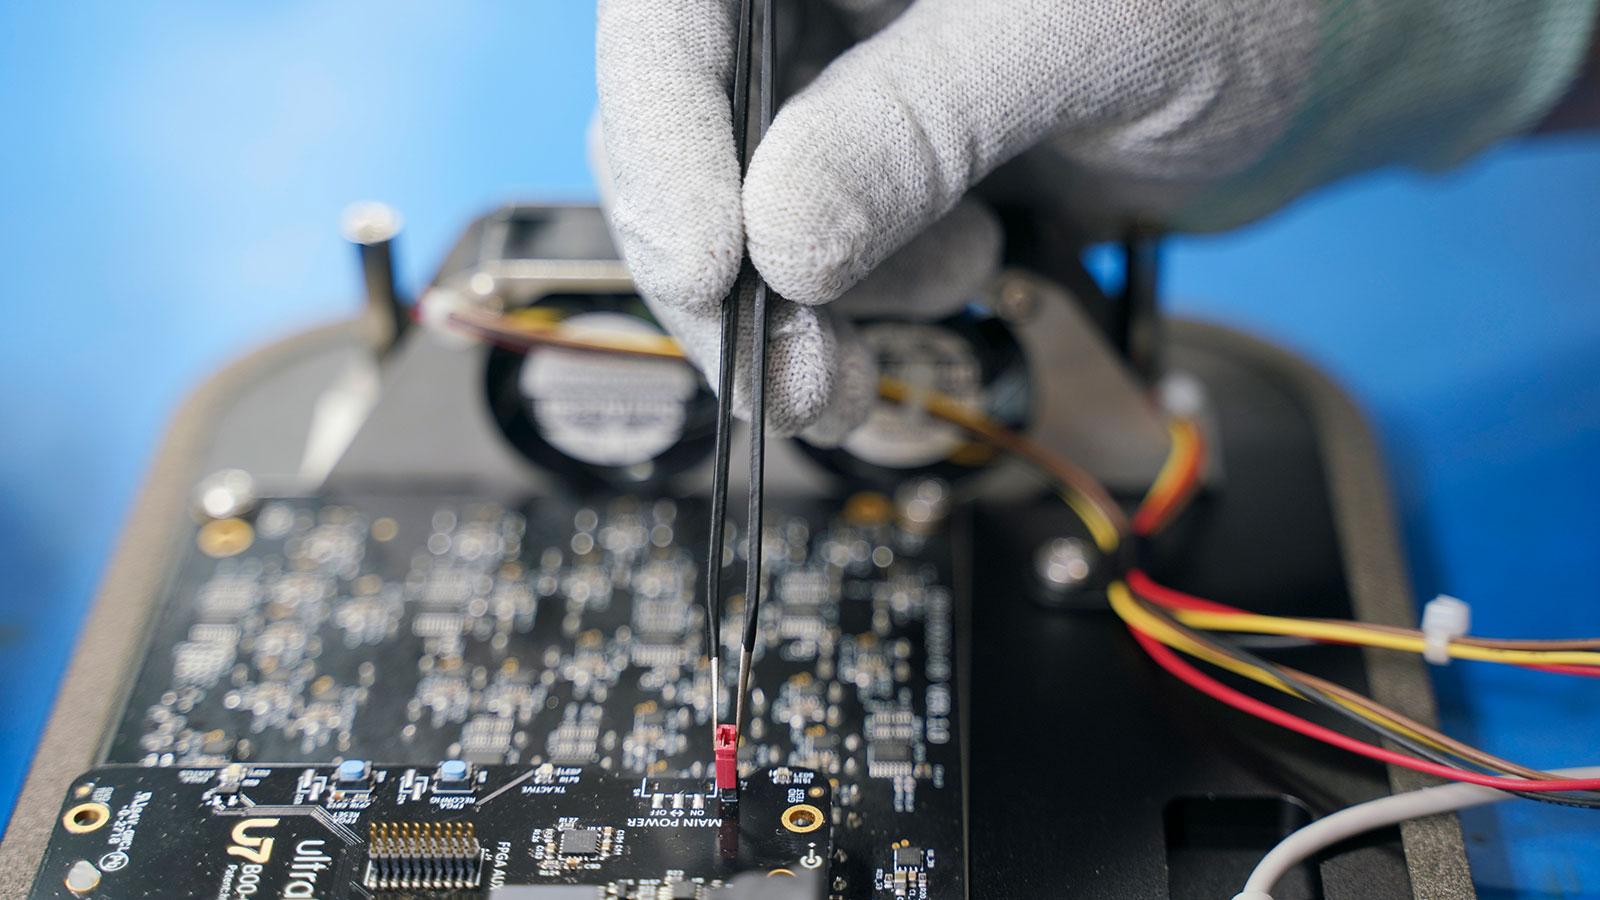 Ultraleap hardware